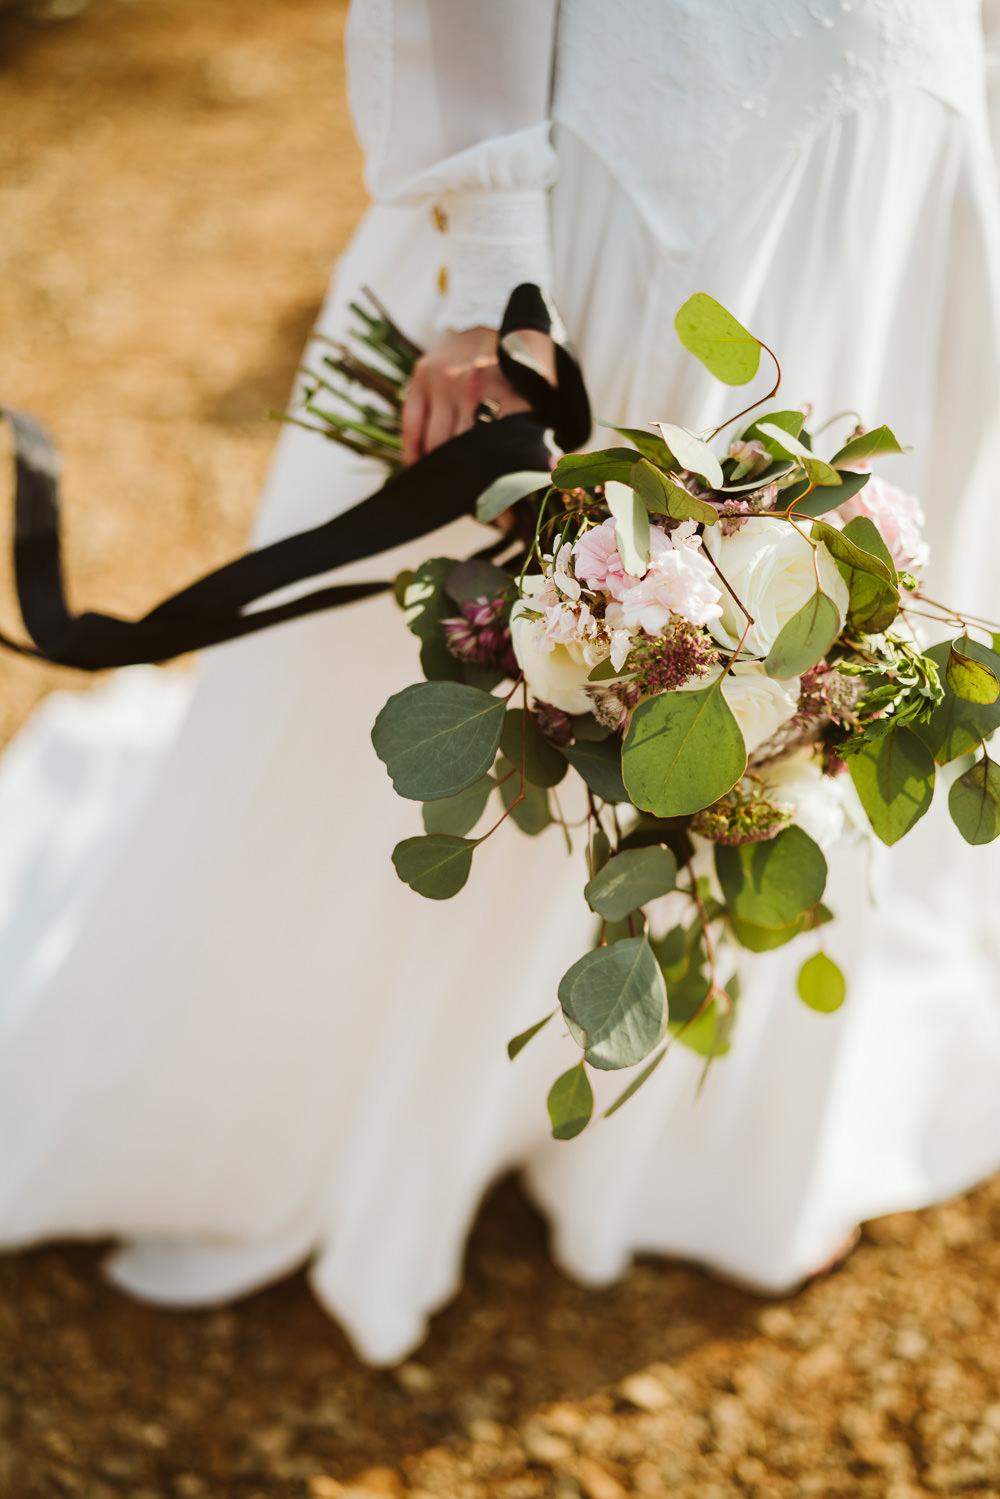 Bouquet Flowers Bride Bridal Black Ribbon Foliage Greenery Rose Berry Clifftop Portugal Wedding Ideas John Barwood Photography